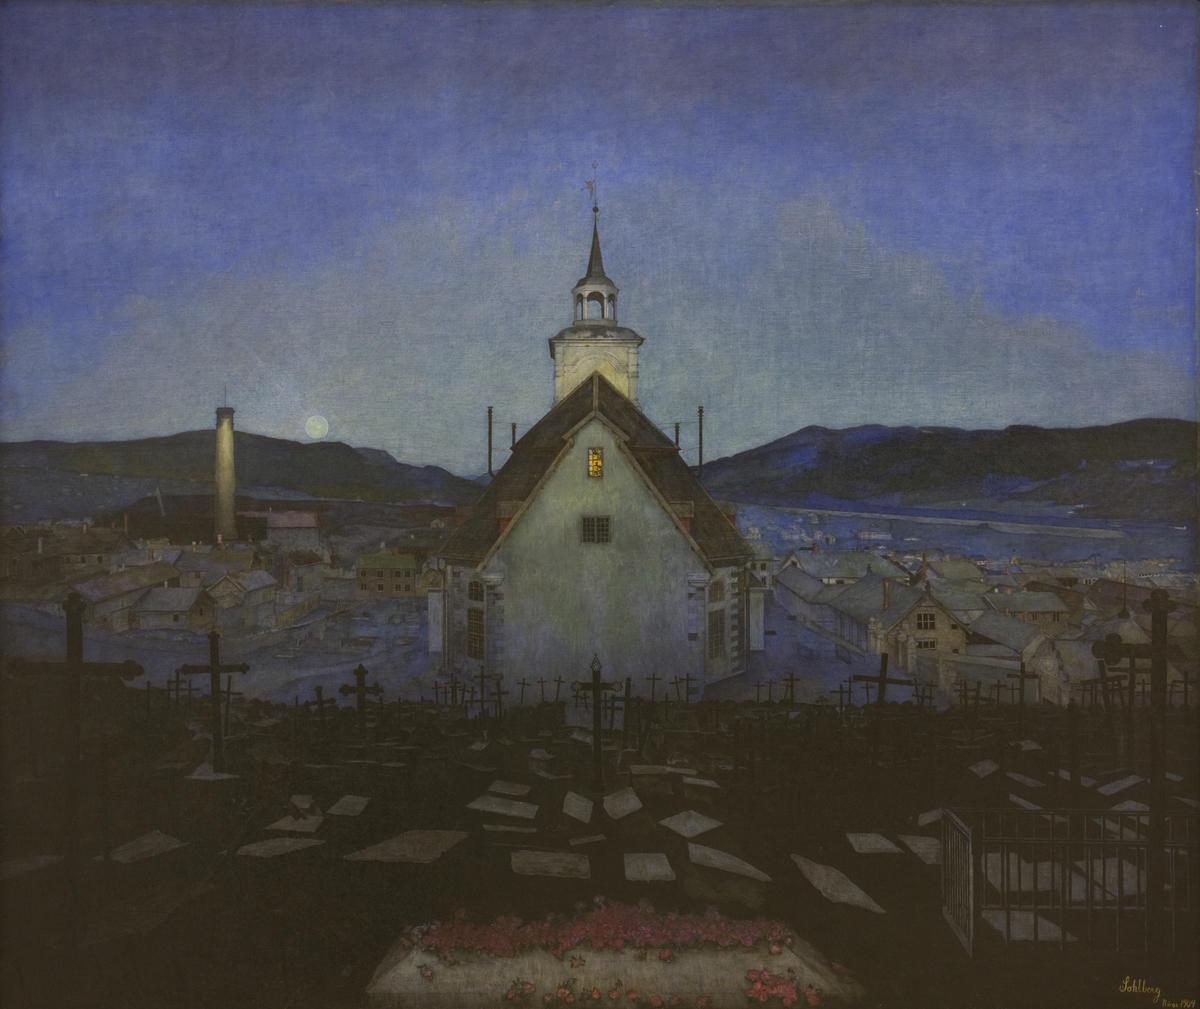 TKM-143-1904_Sohlberg_Harald_Rros_kirke_1904.tif